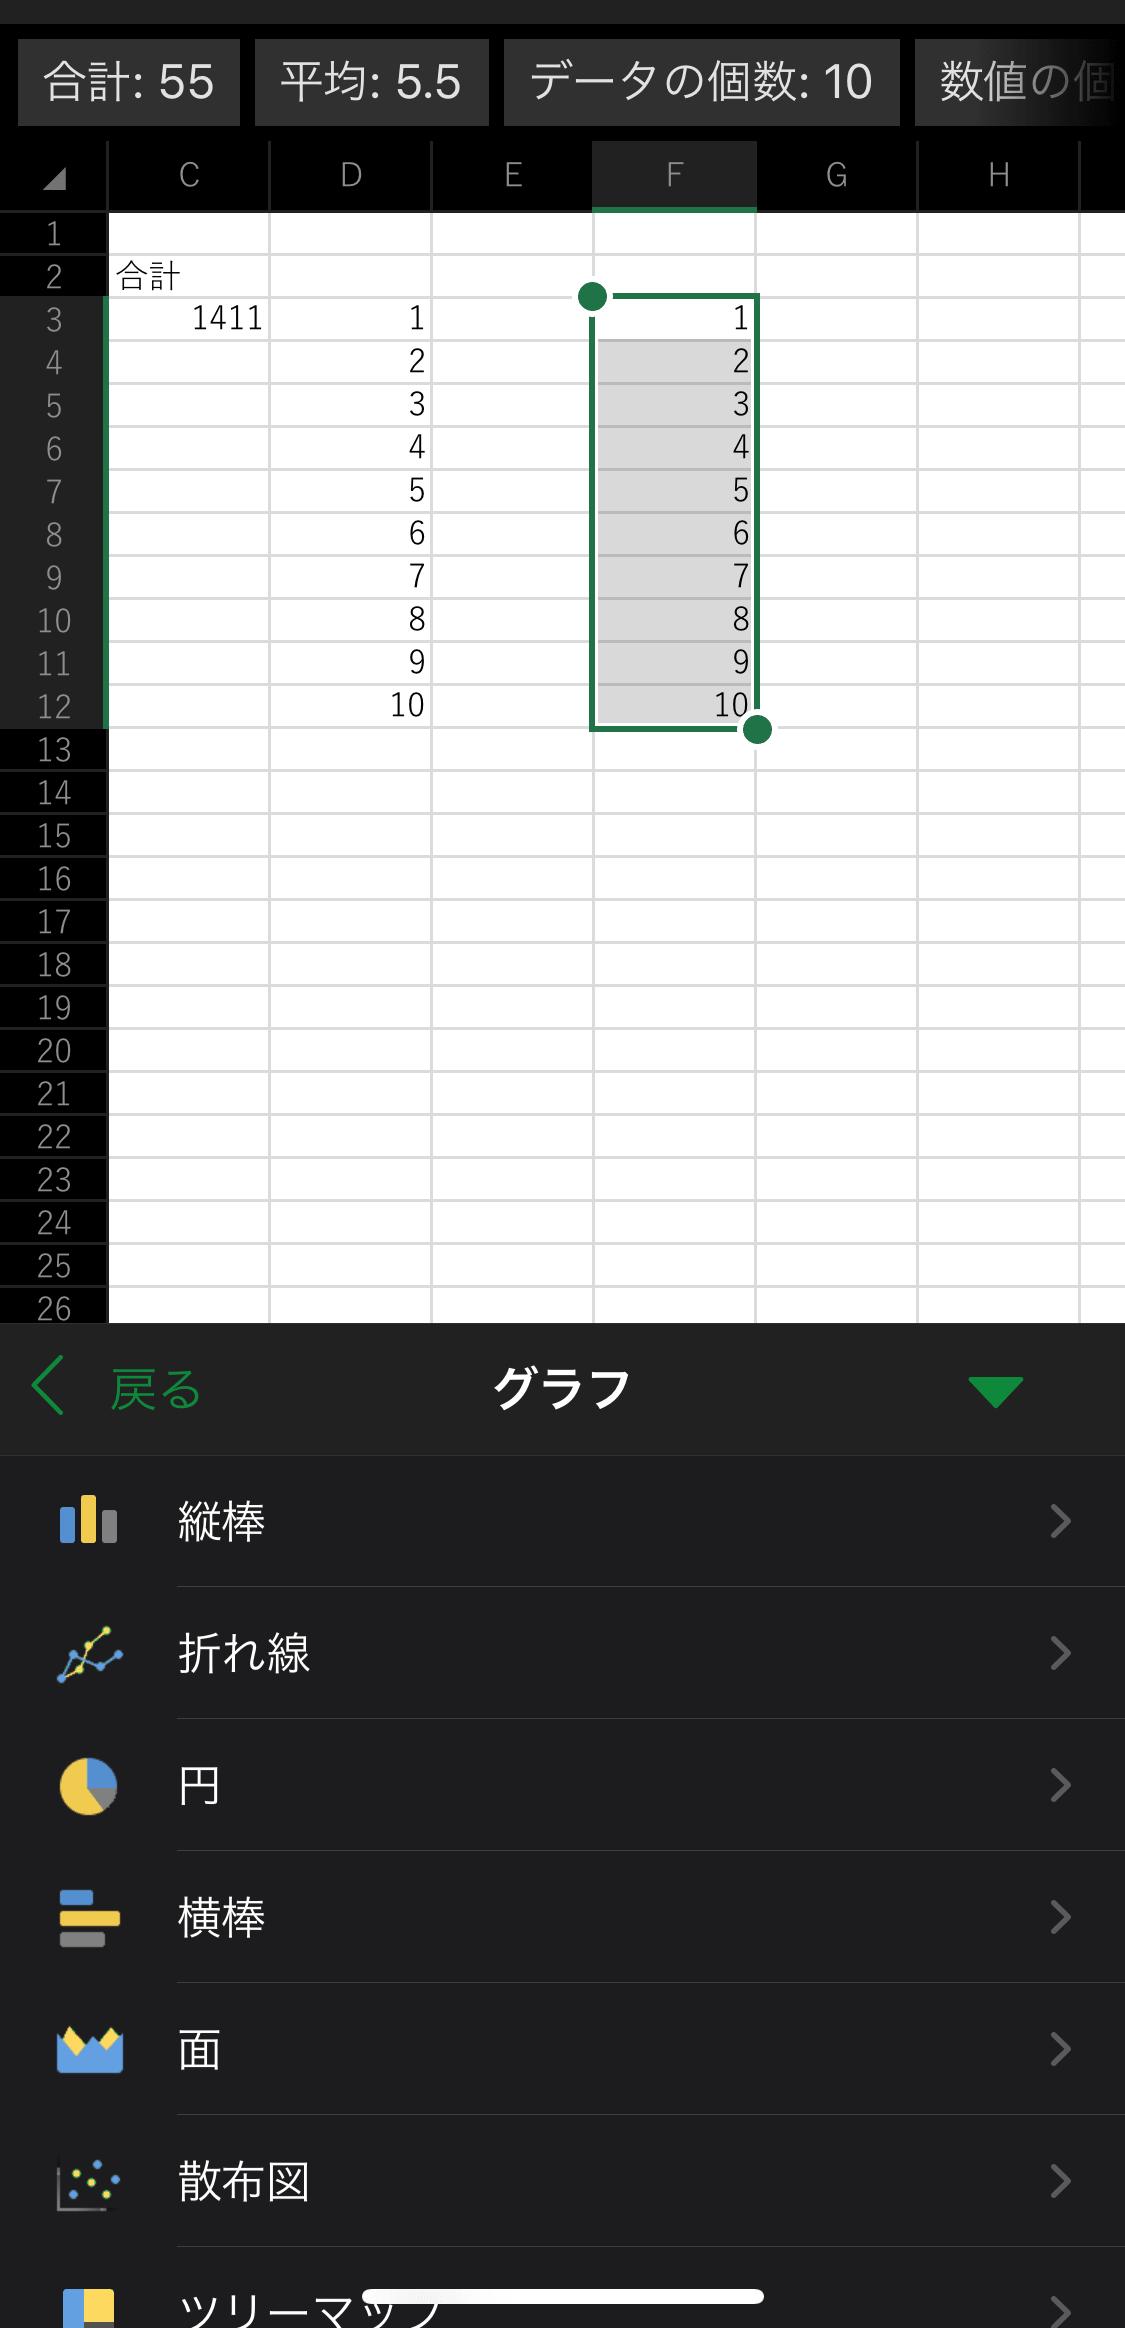 iPhoneでのエクセルアプリの使い方・編集方法・保存方法6